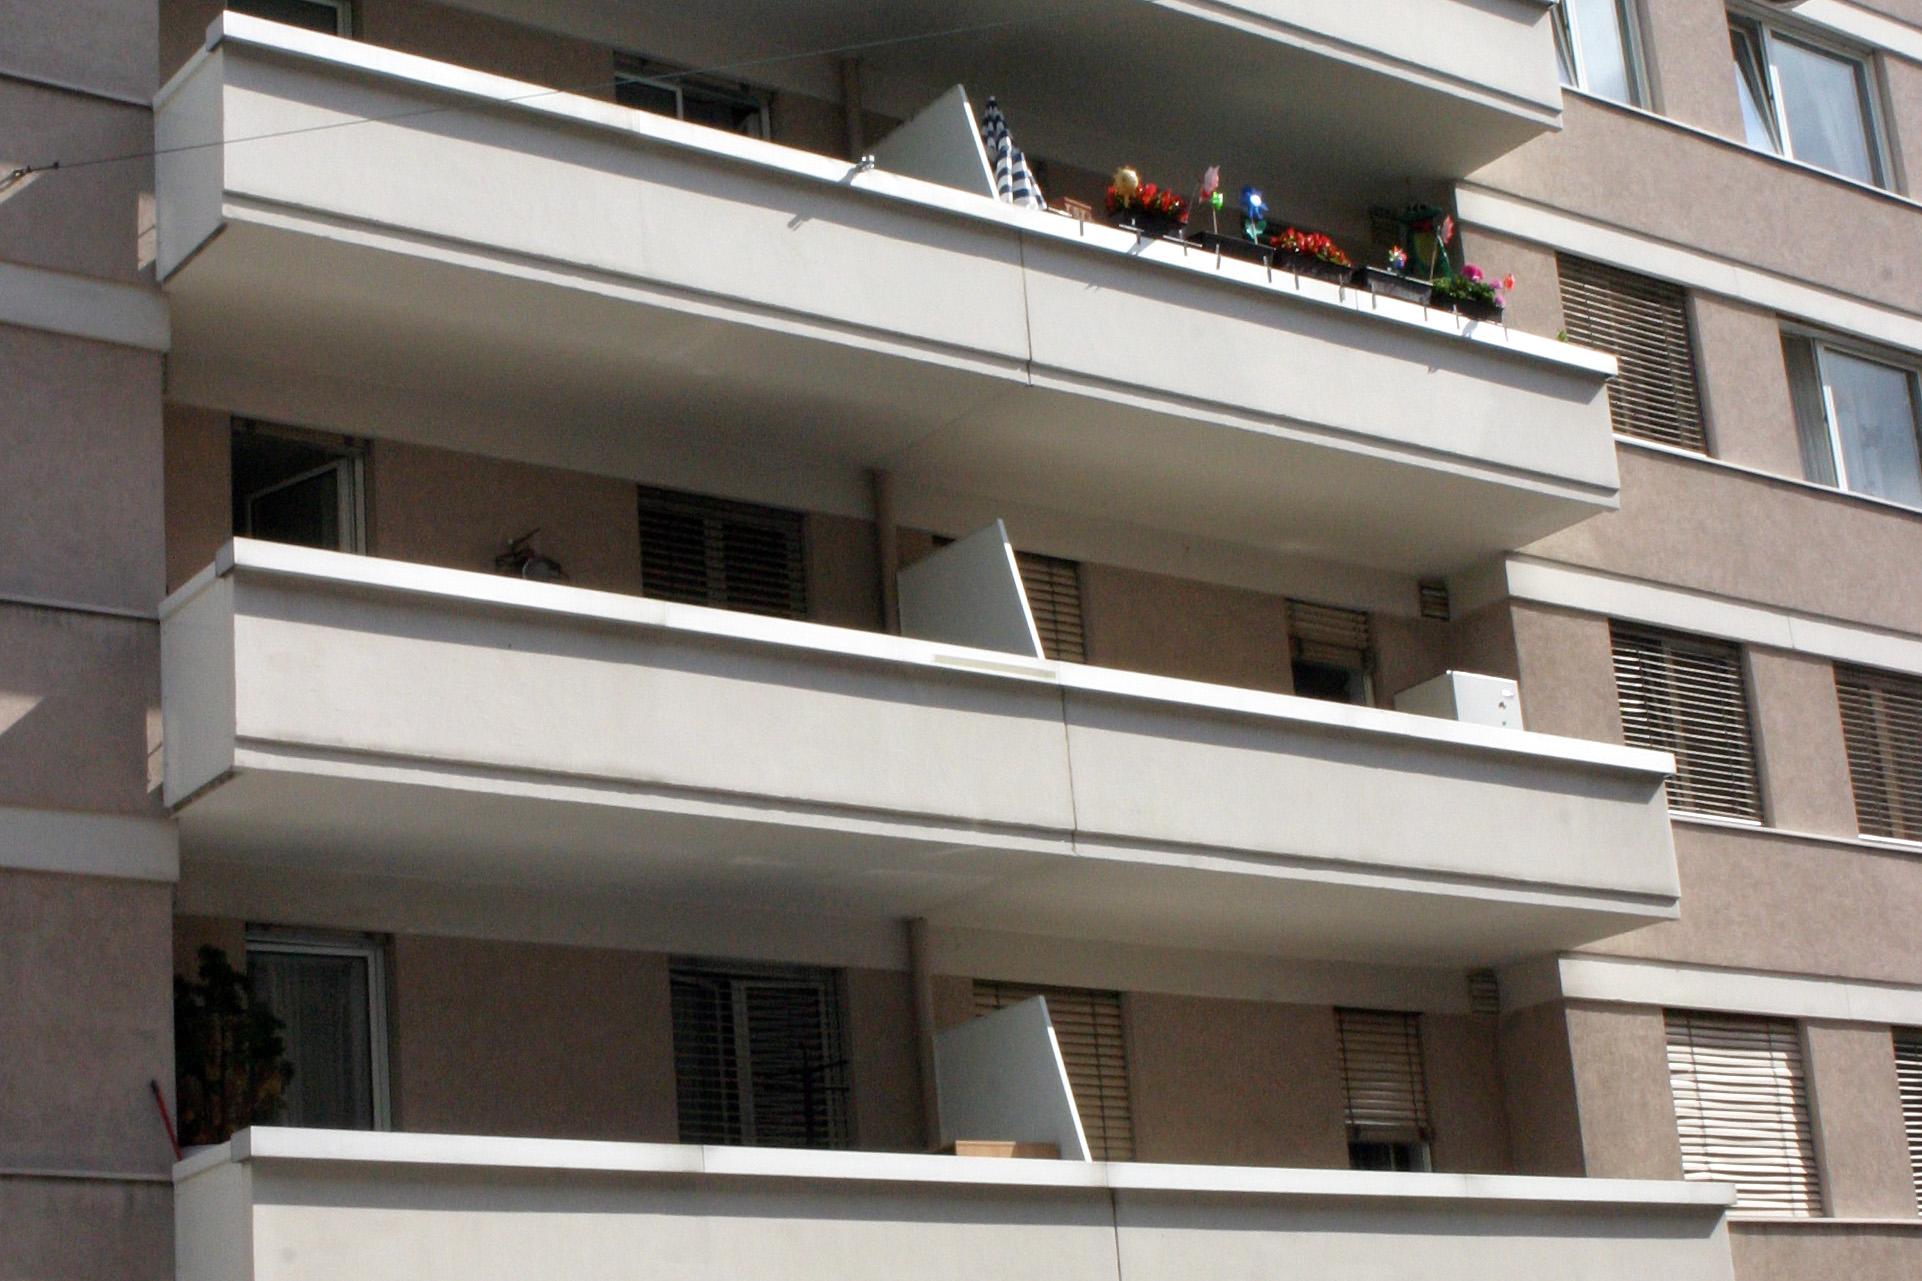 Mehrfamilienhaus in 4053 Basel